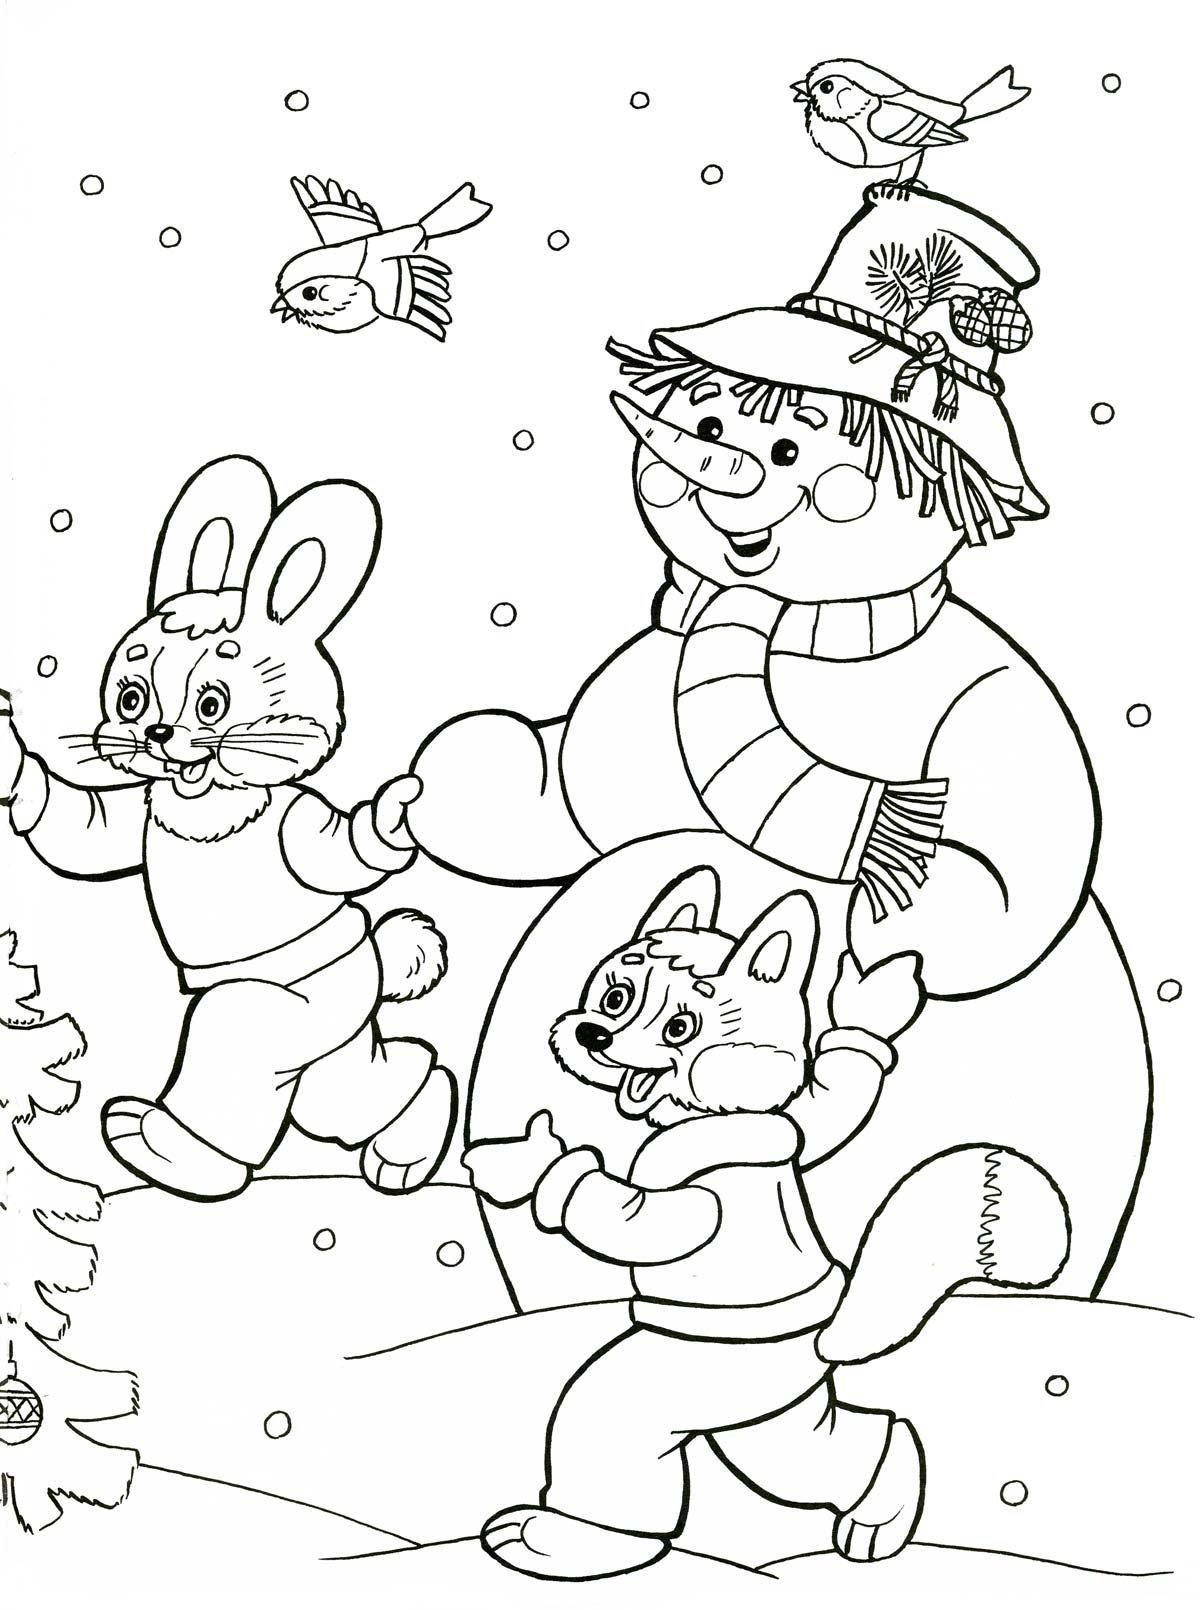 Картинка для раскраски на тему зима